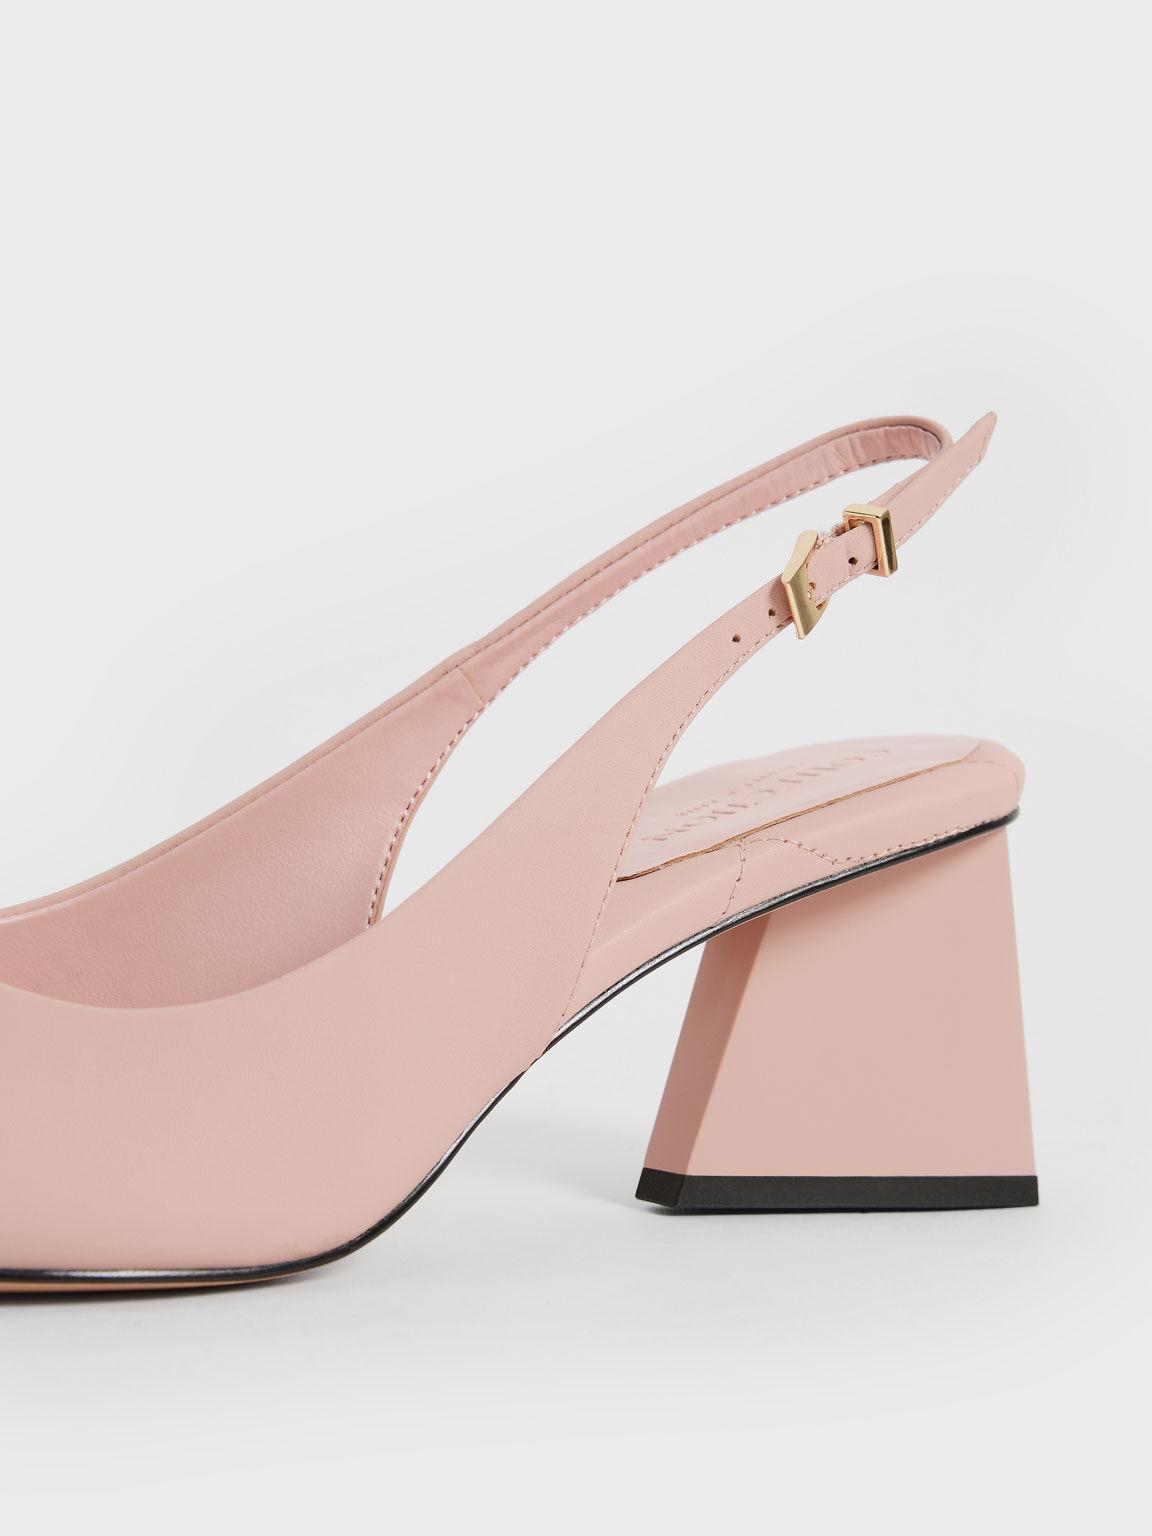 Sepatu Leather Pointed Toe Slingback Pumps, Pink, hi-res